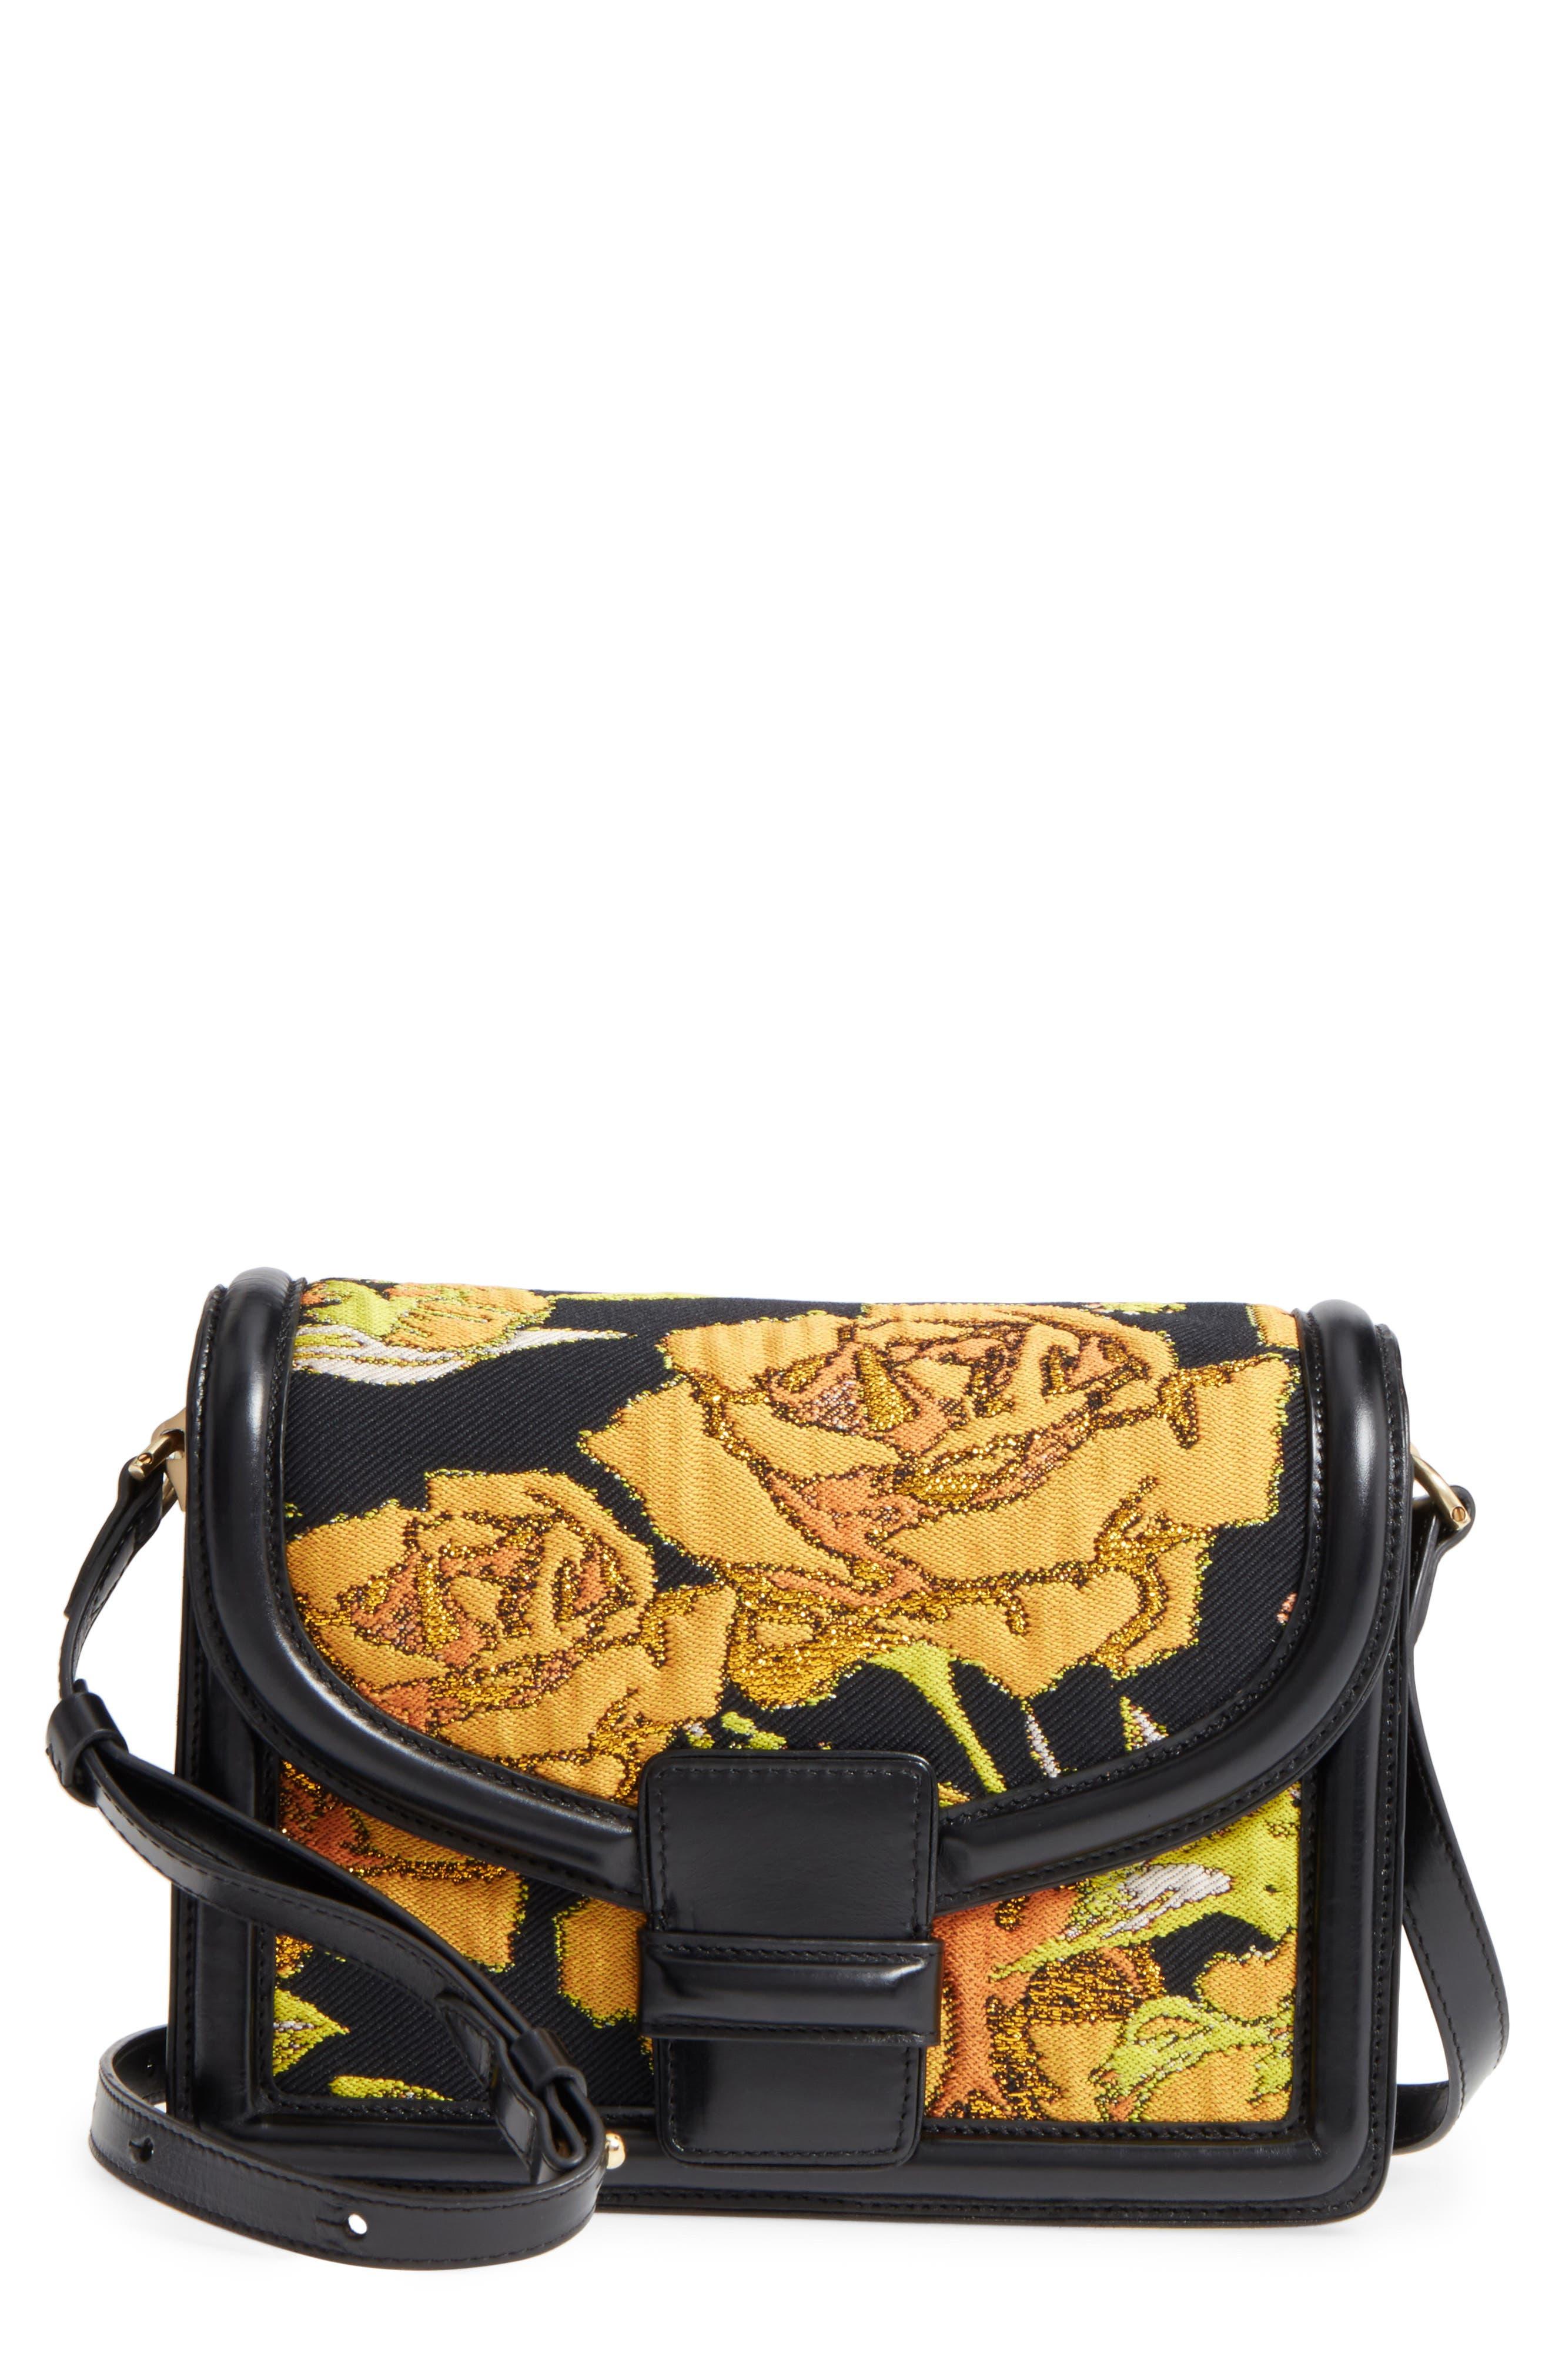 DRIES VAN NOTEN Floral Jacquard & Leather Crossbody Bag, Main, color, 700